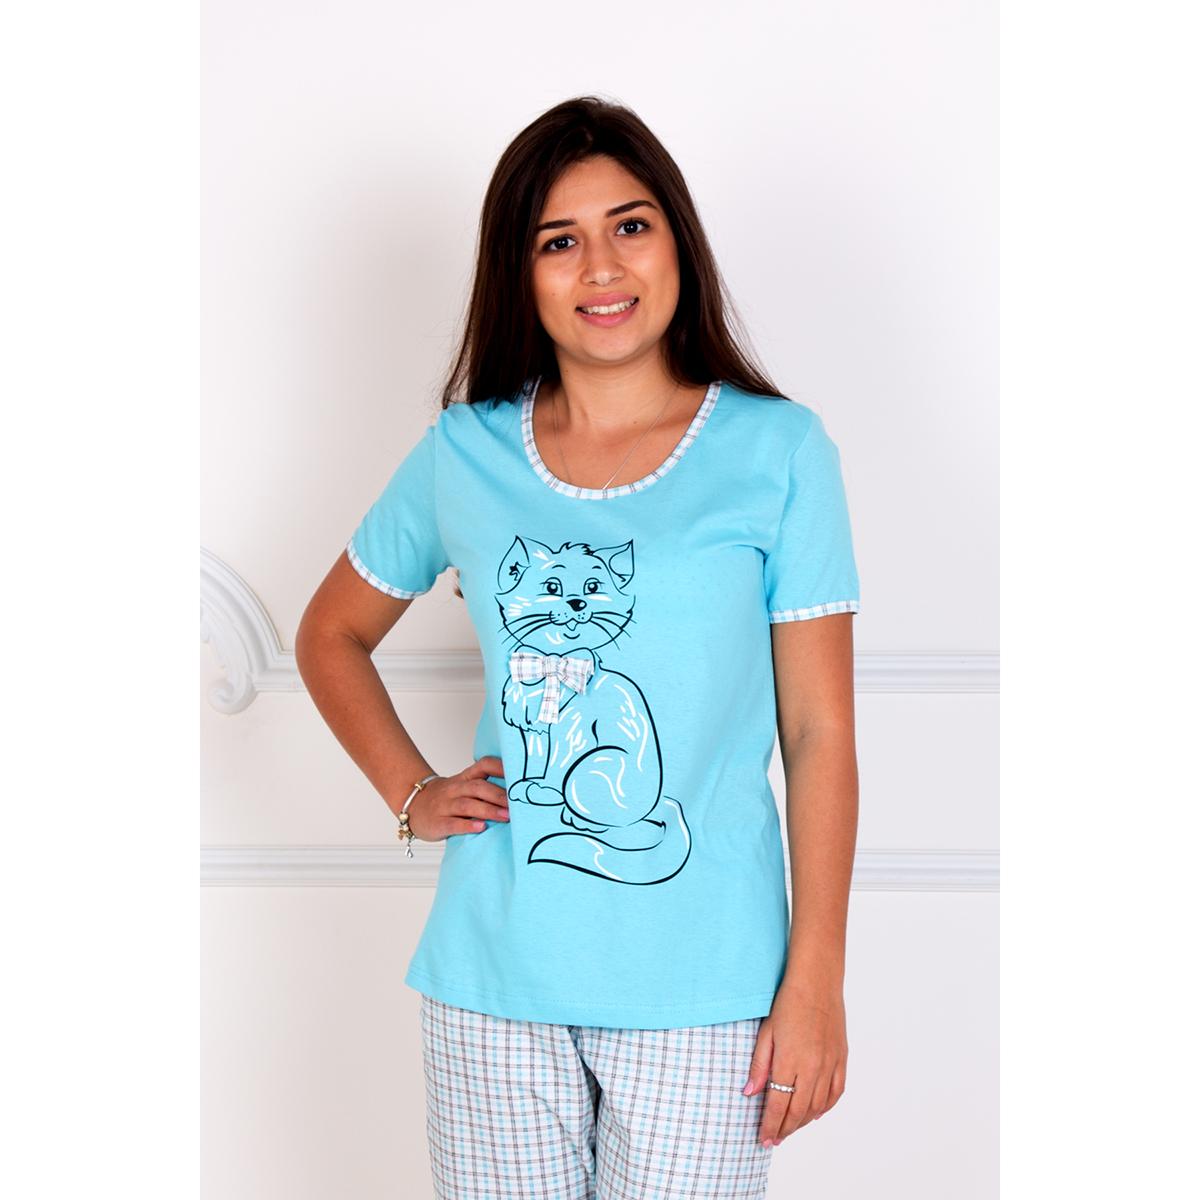 Женский пижама Киска Бирюзовый, размер 52Пижамы<br>Обхват груди:104 см<br>Обхват талии:85 см<br>Обхват бедер:112 см<br>Рост:167 см<br><br>Тип: Жен. костюм<br>Размер: 52<br>Материал: Кулирка